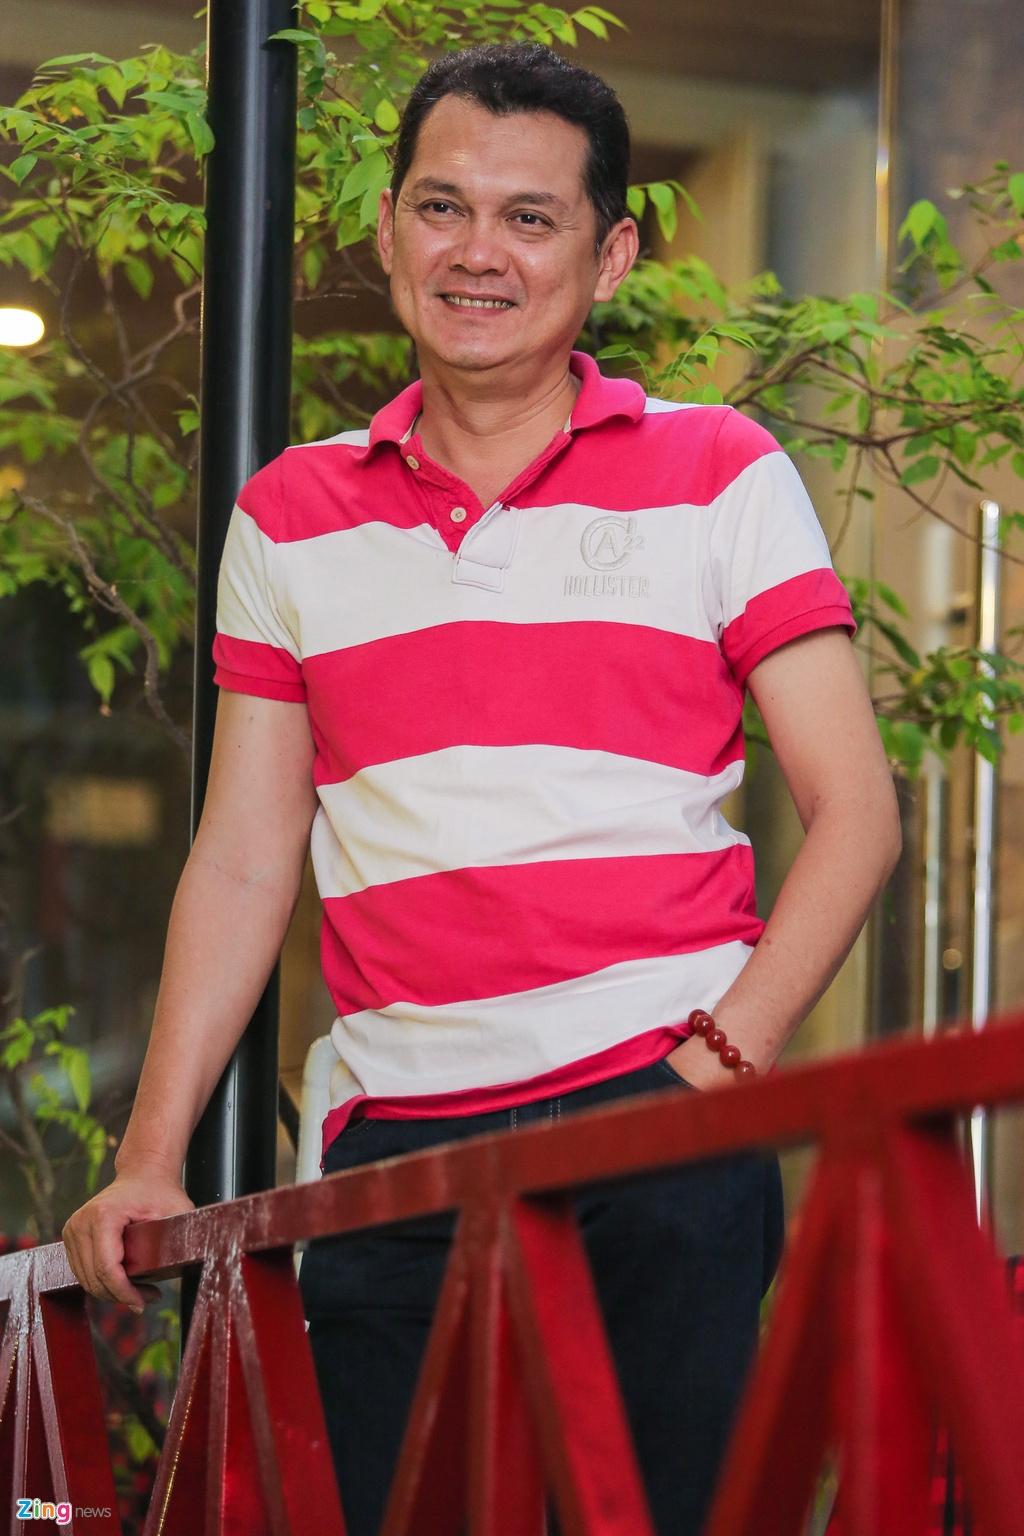 Cuoc song khong vo con cua NSUT Huu Chau o tuoi 50 hinh anh 4